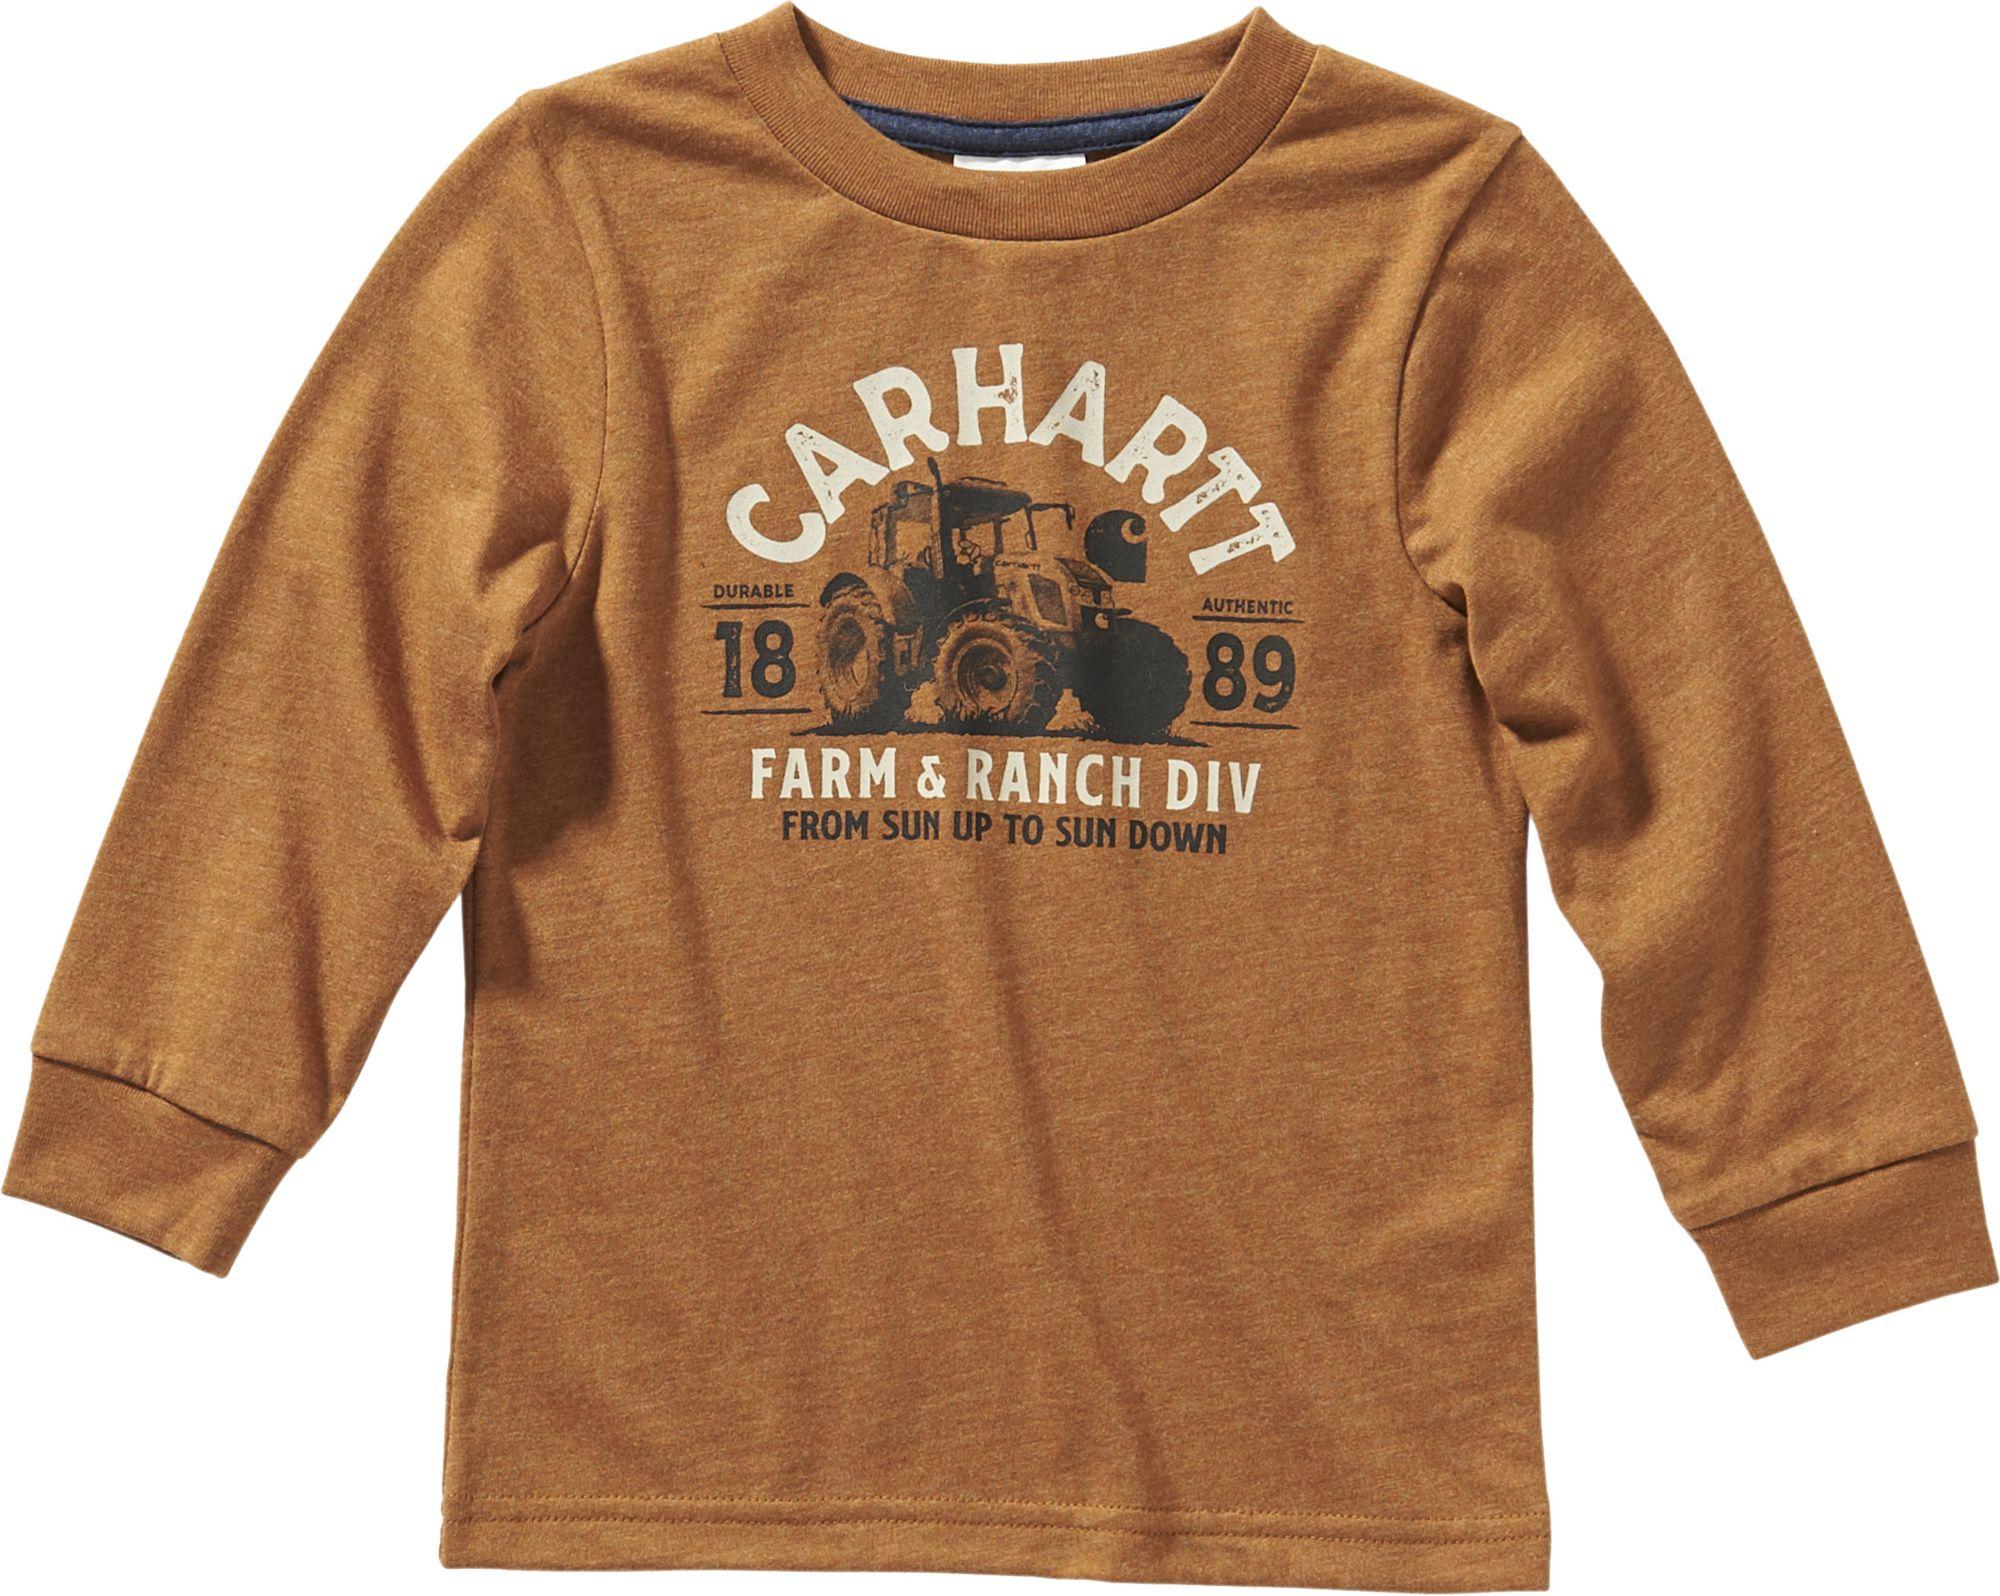 Carhartt boysLong Sleeve Tee Shirt Long Sleeves T-Shirt